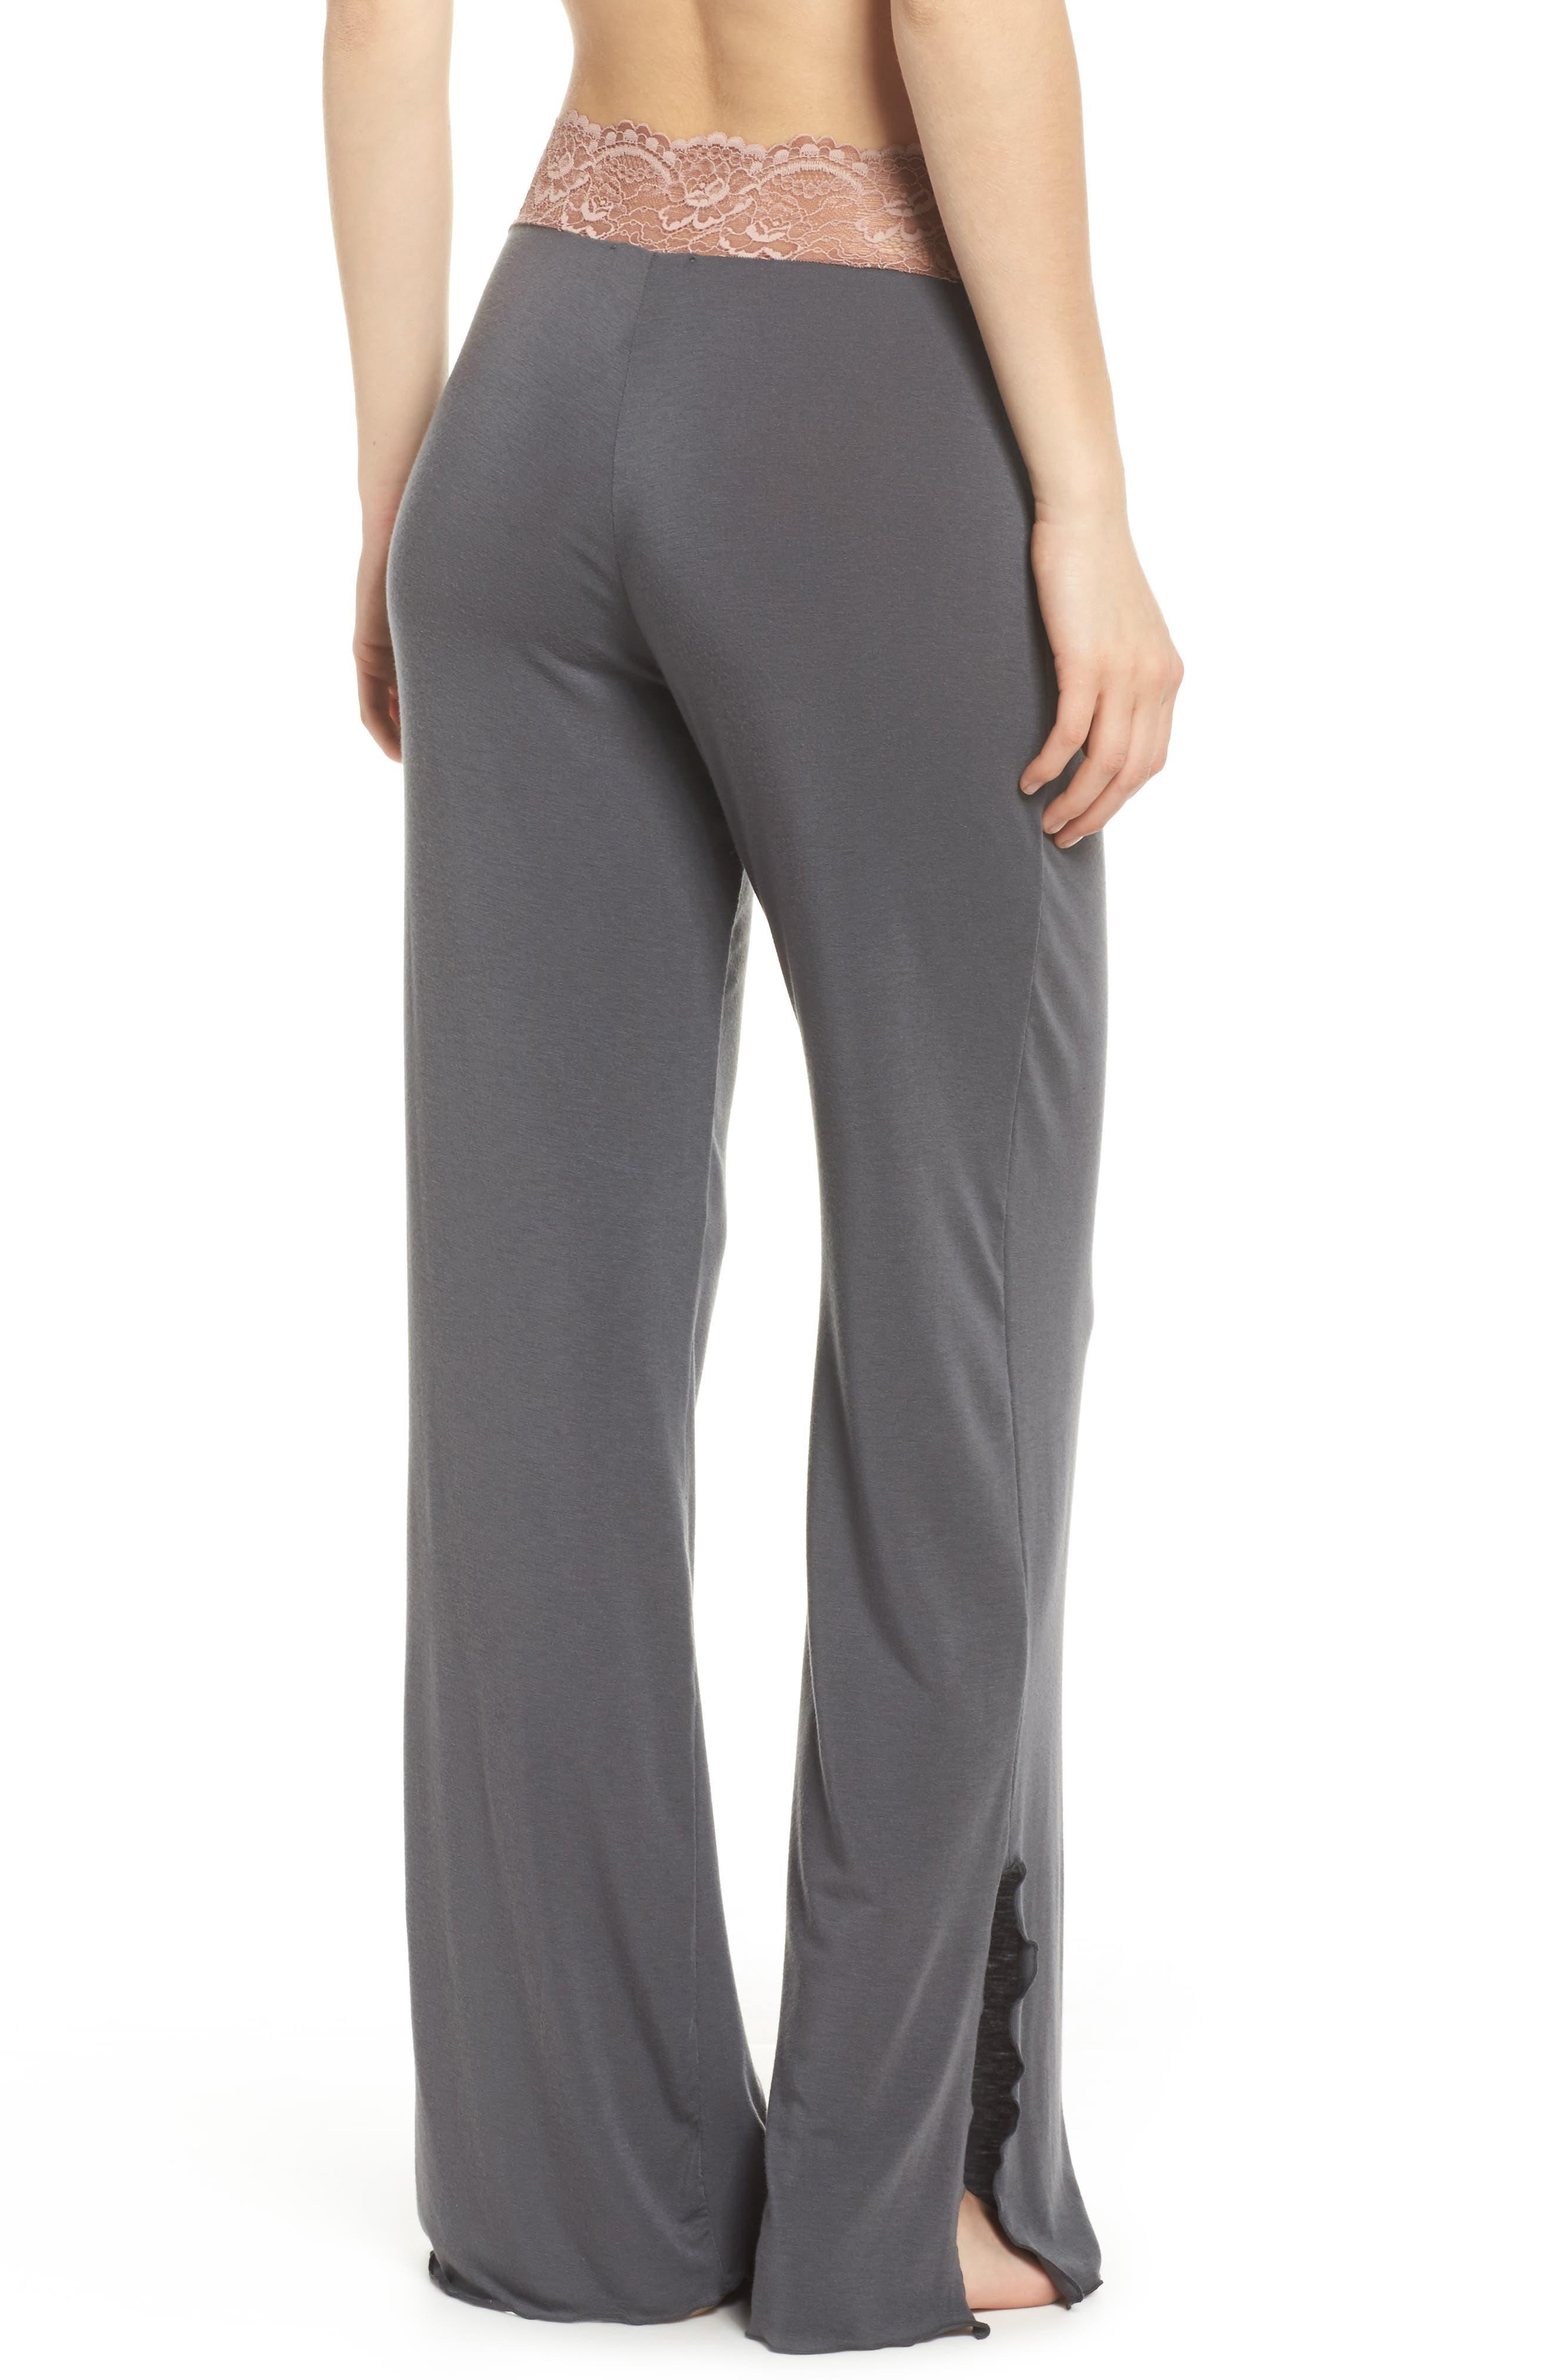 Lace Trim Pants,                             Alternate thumbnail 2, color,                             SLATE WITH JAVA LACE